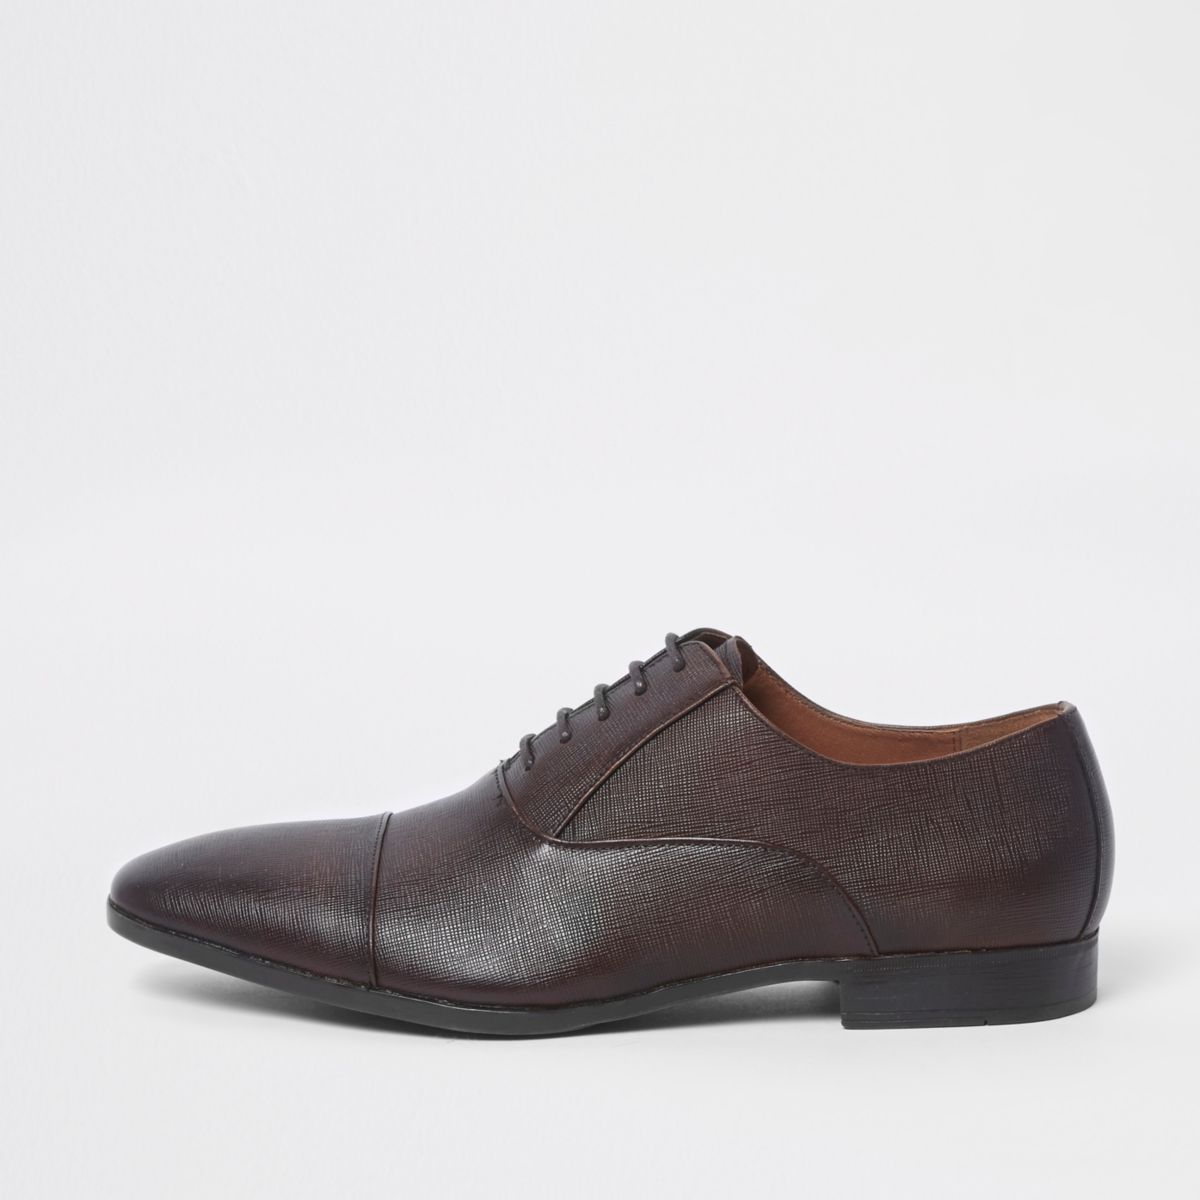 Brown embossed toecap Oxford shoes